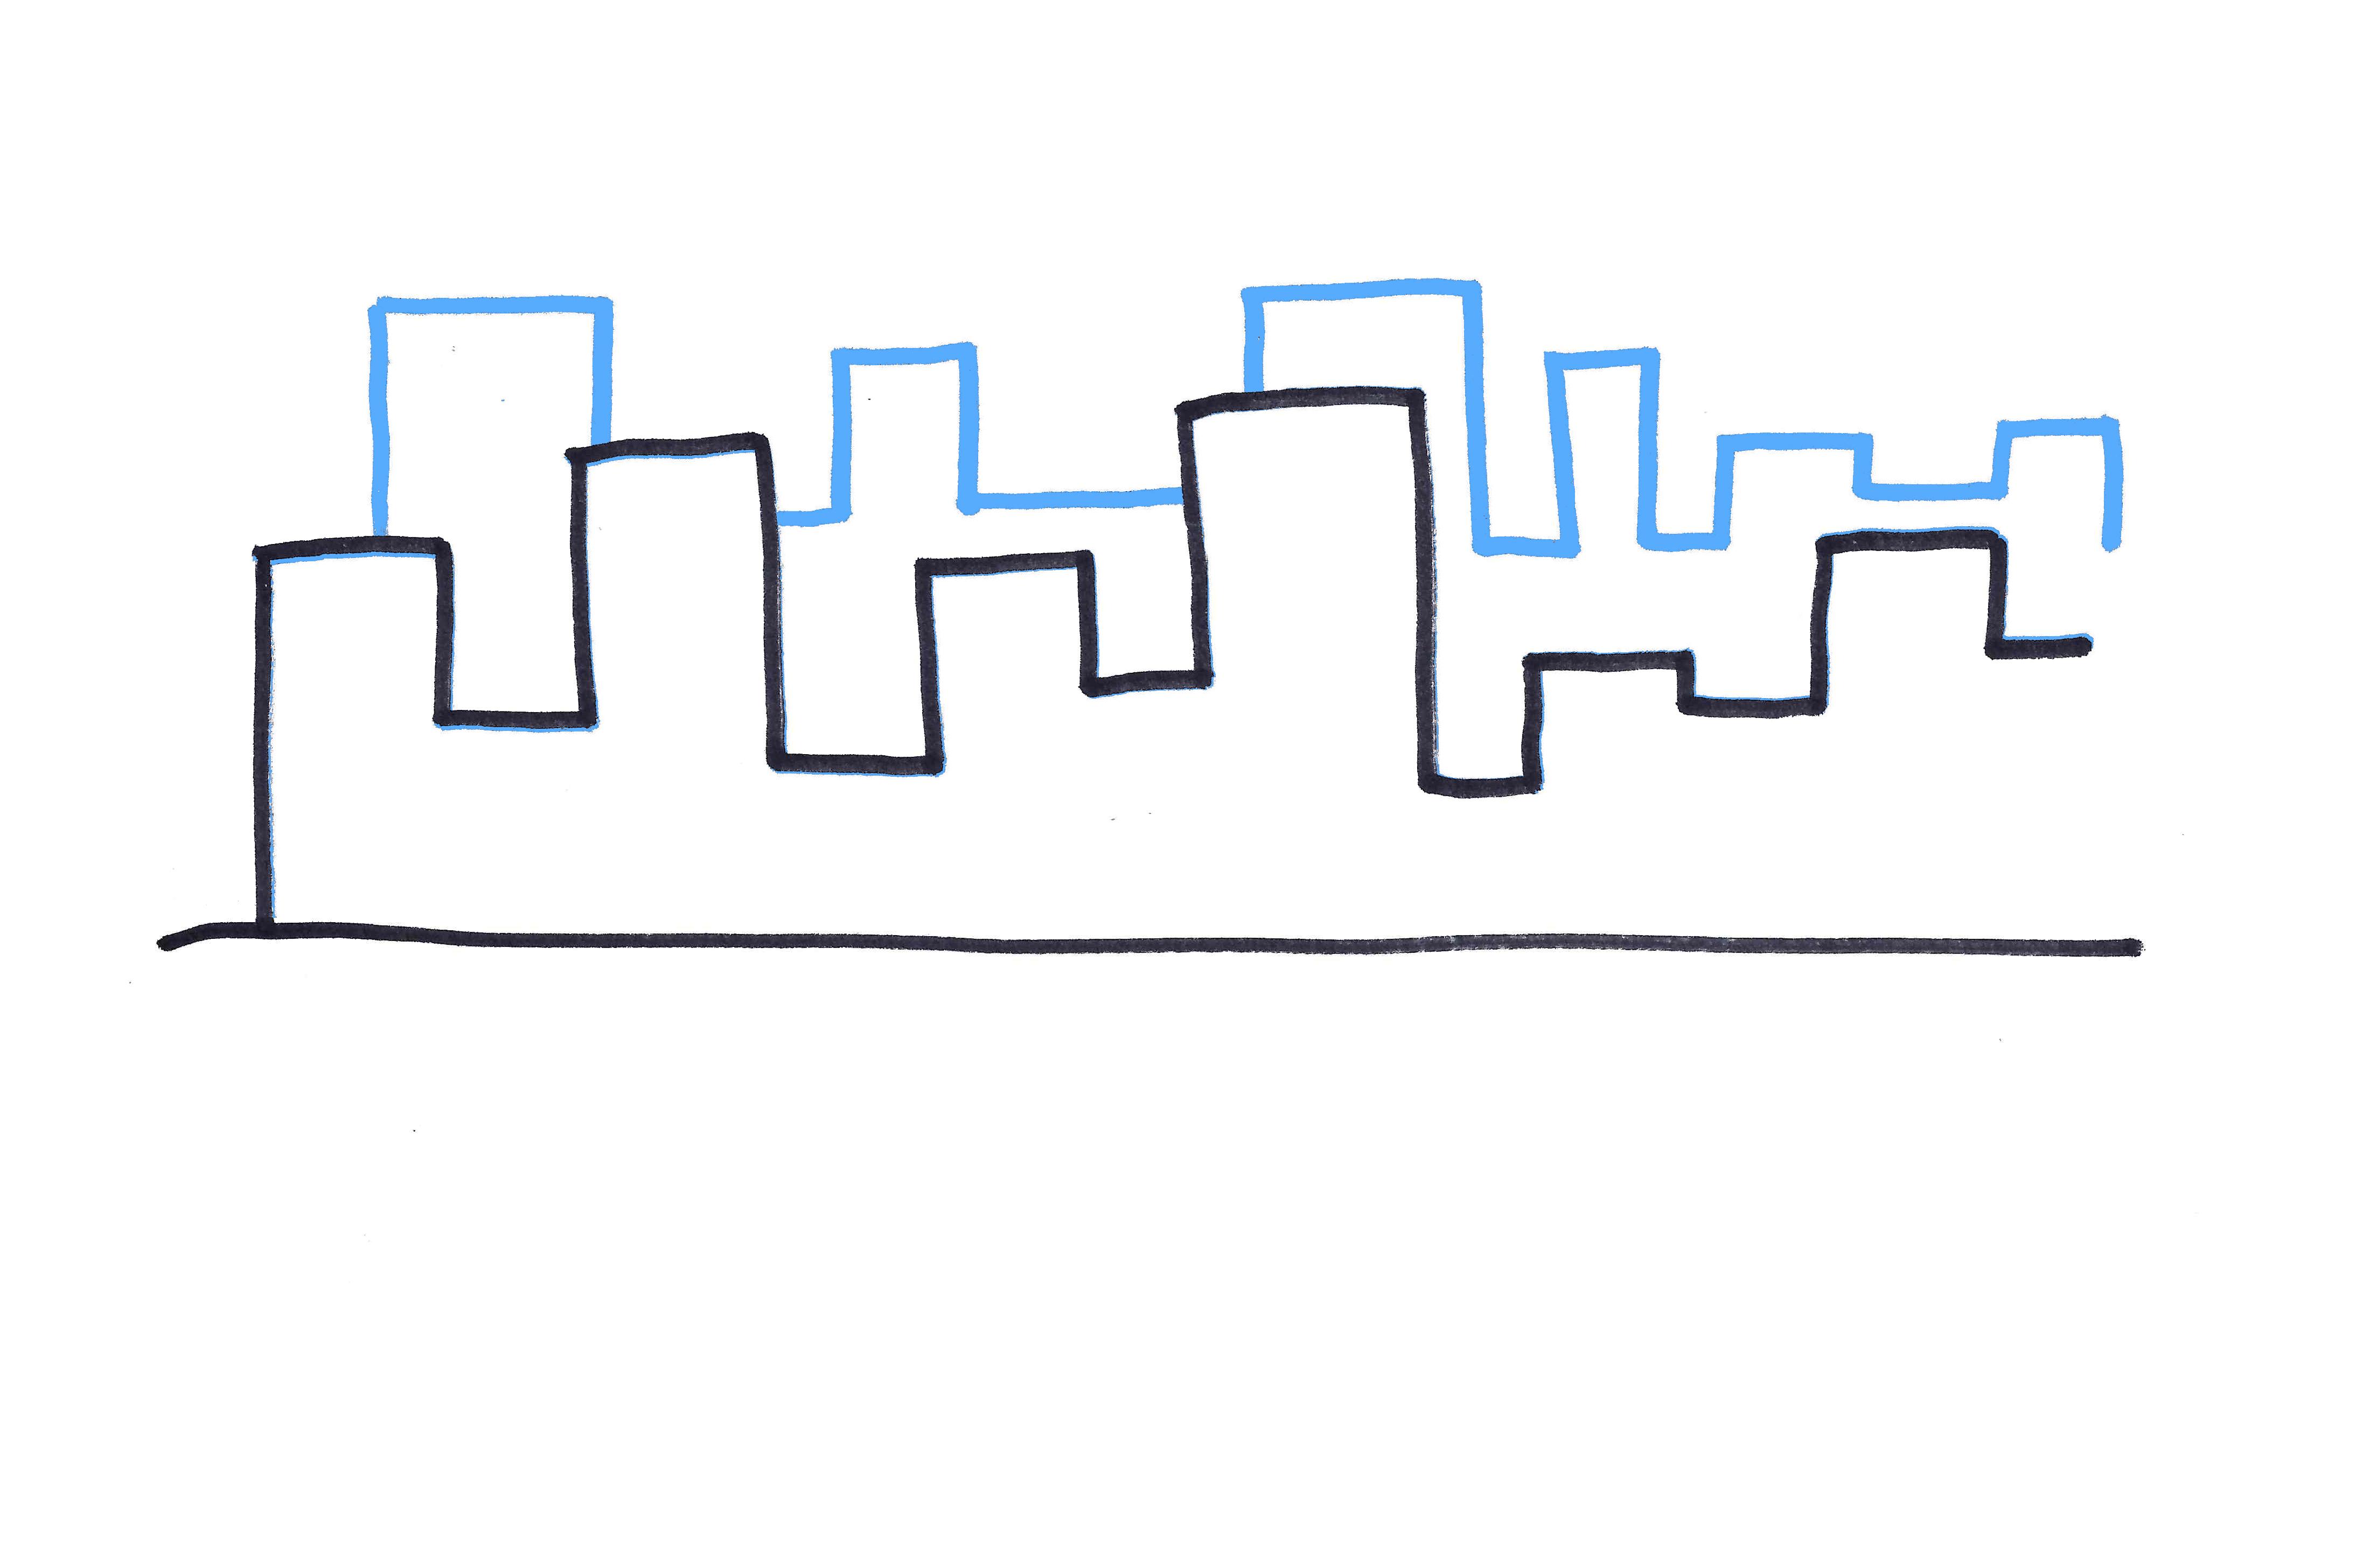 Drawn skyline simple 3 second Skyline to level